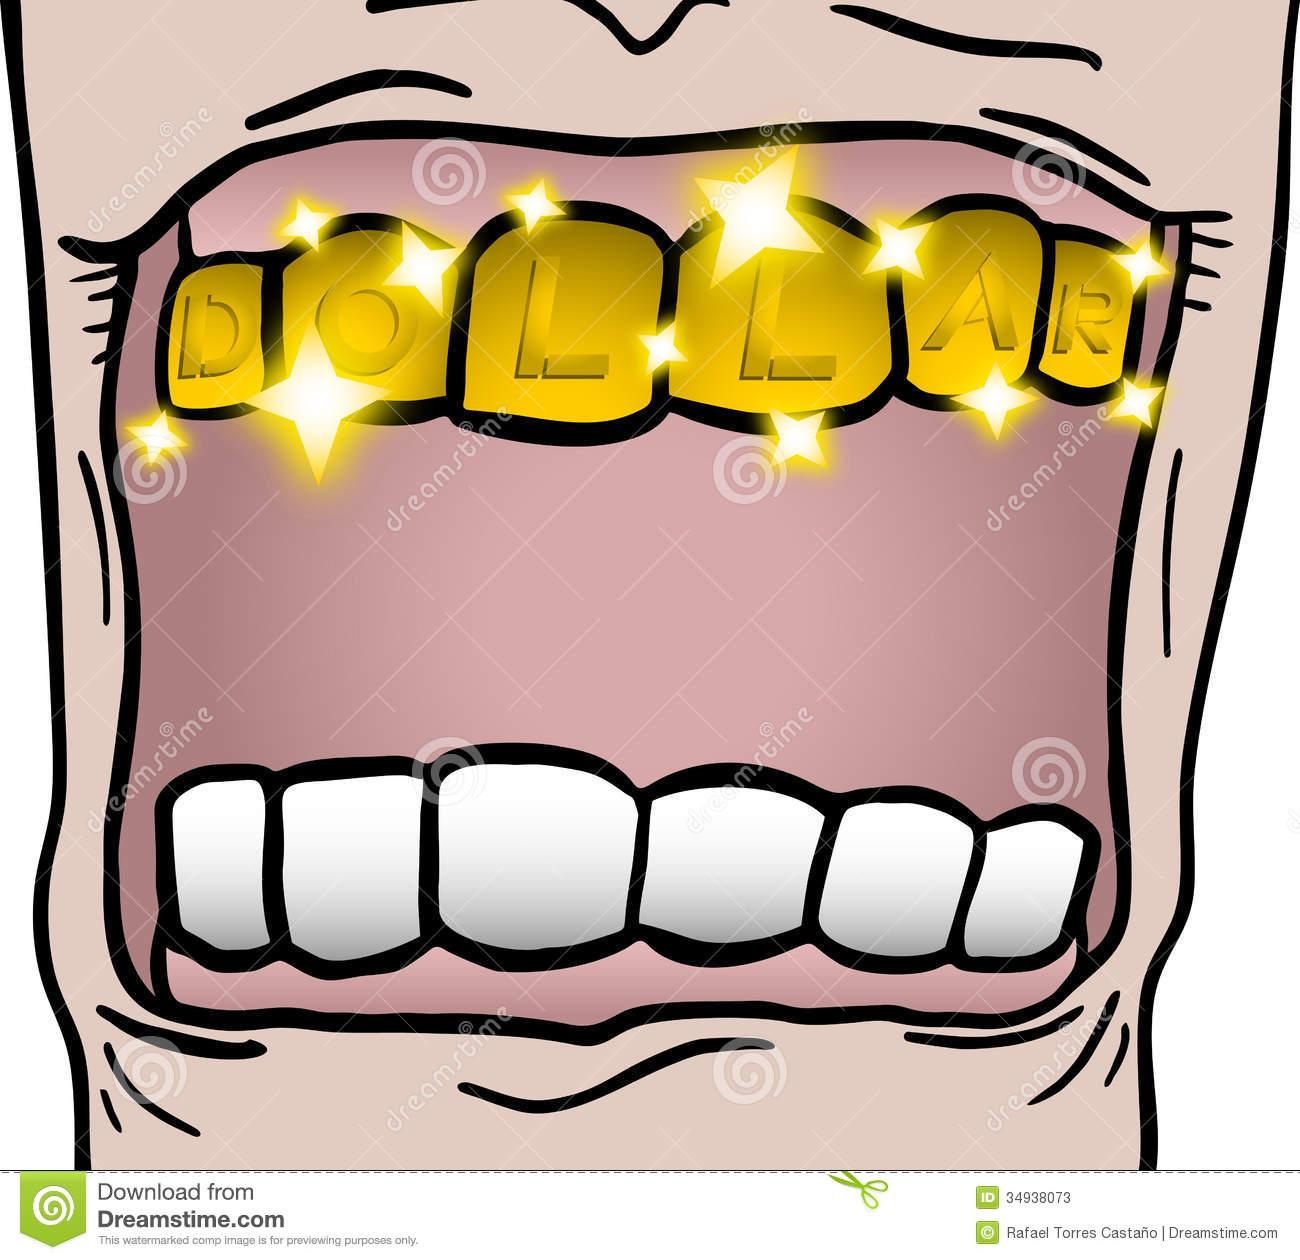 Gold Tooth Stock Photos.